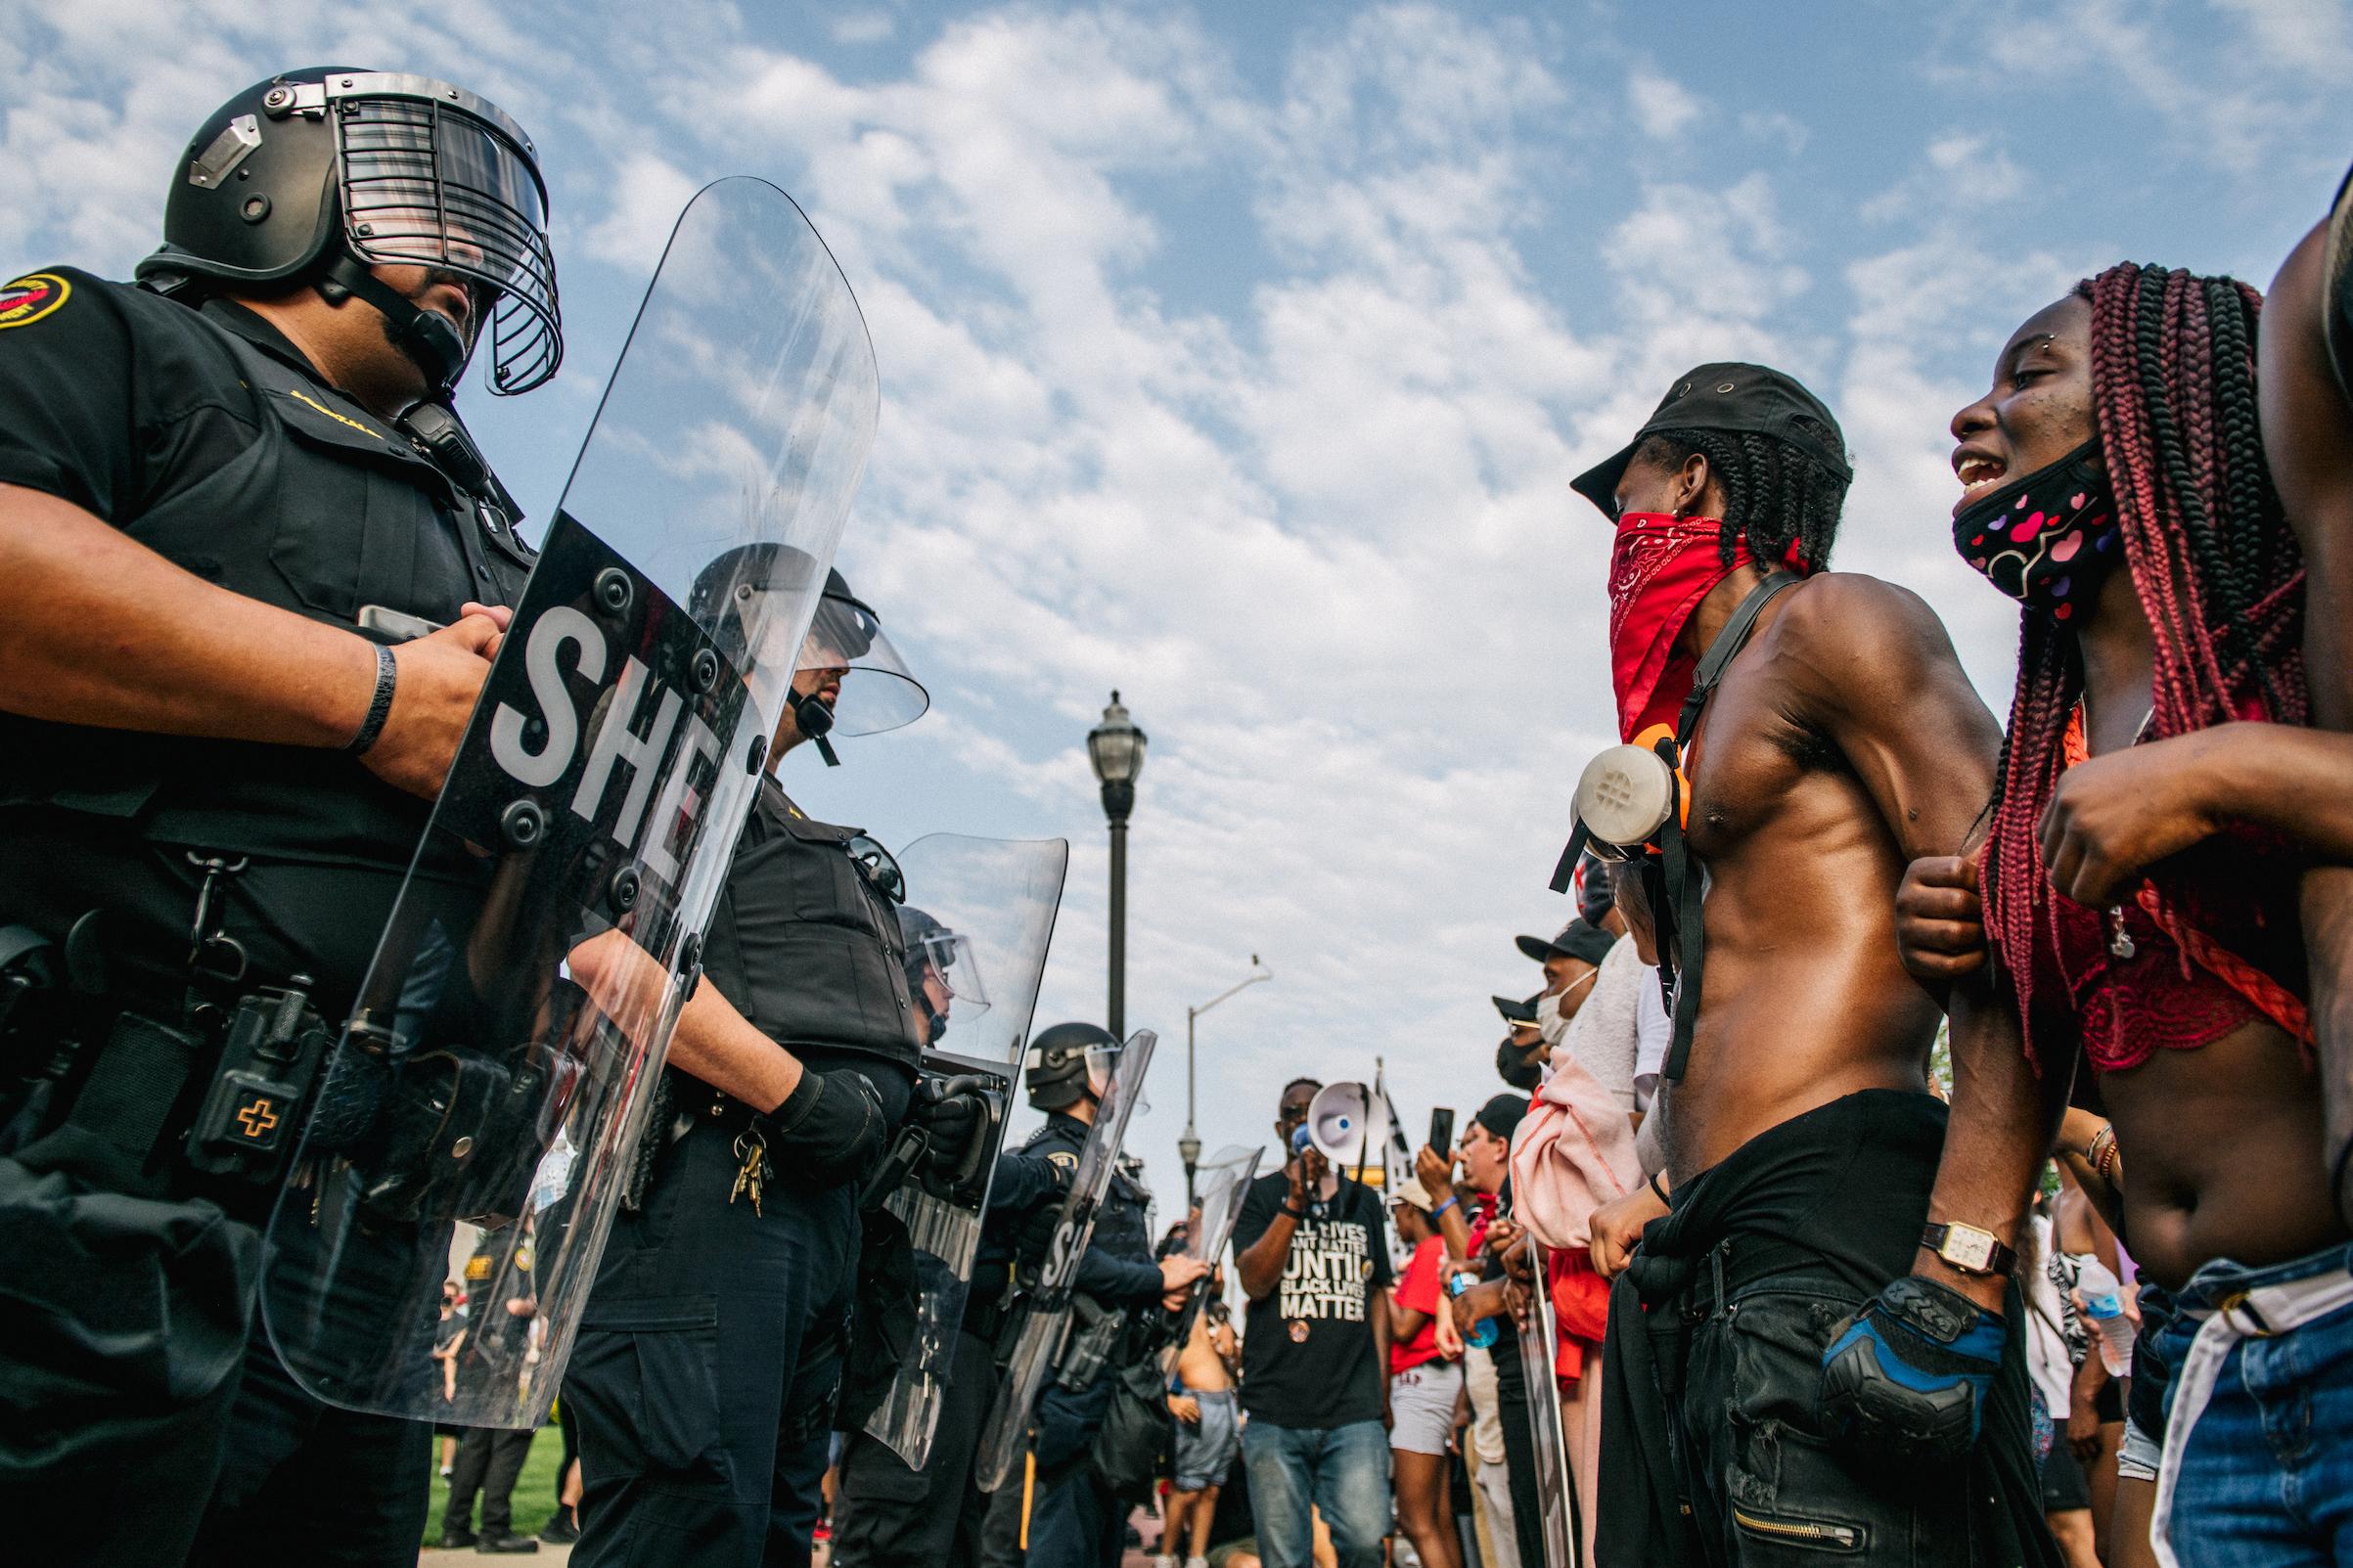 Demonstrators form a line in front of law enforcement on Aug. 24, 2020, in Kenosha, Wisc.